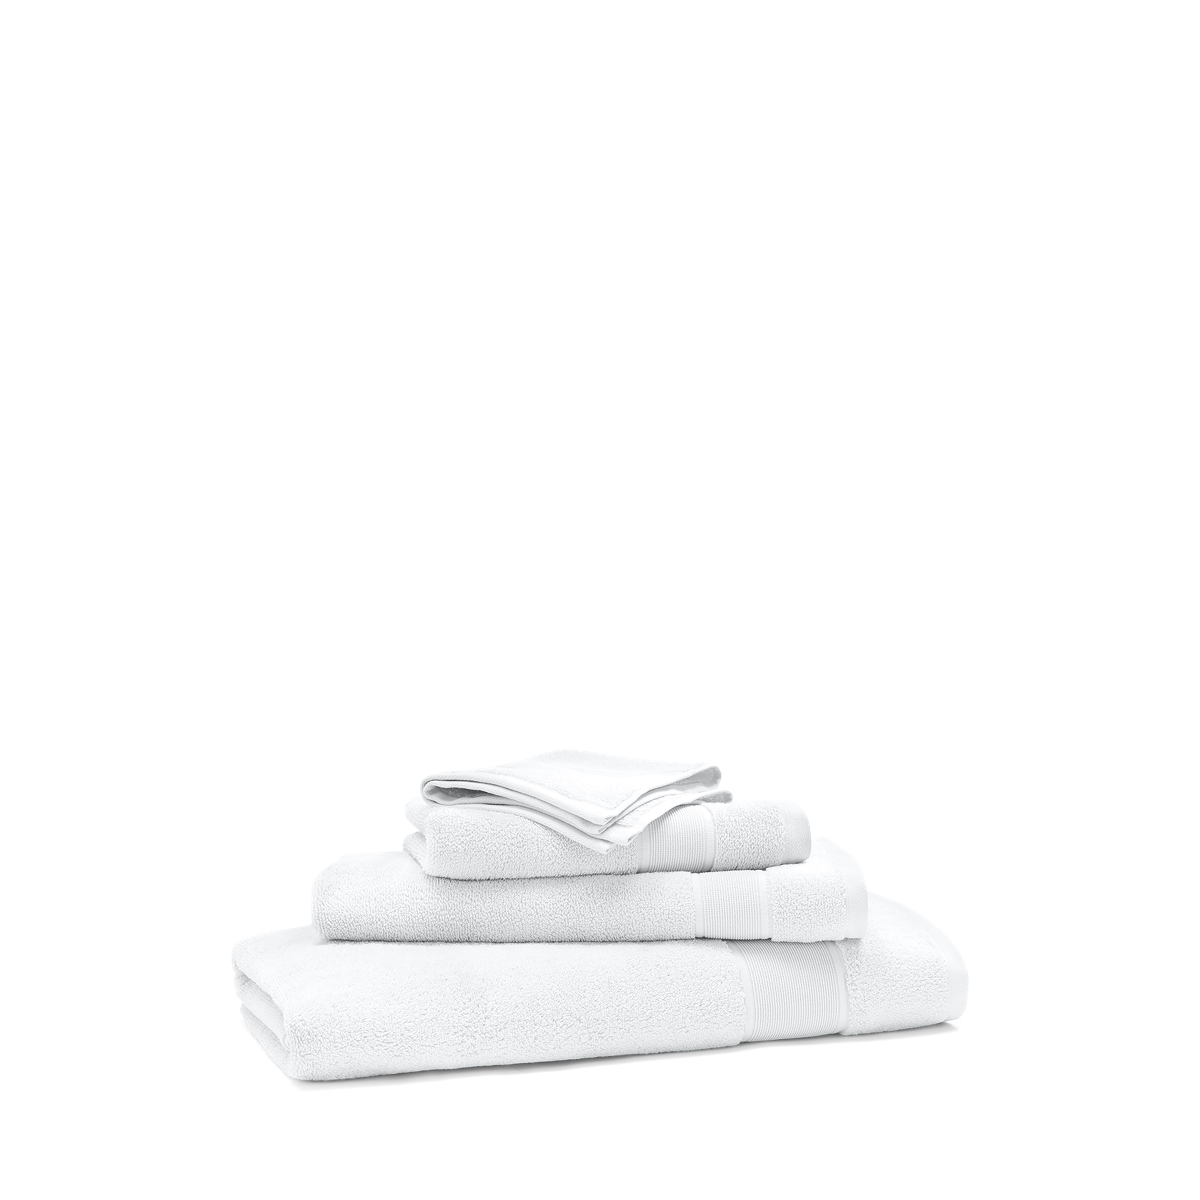 Sanders Bath Towels & Bath Mat